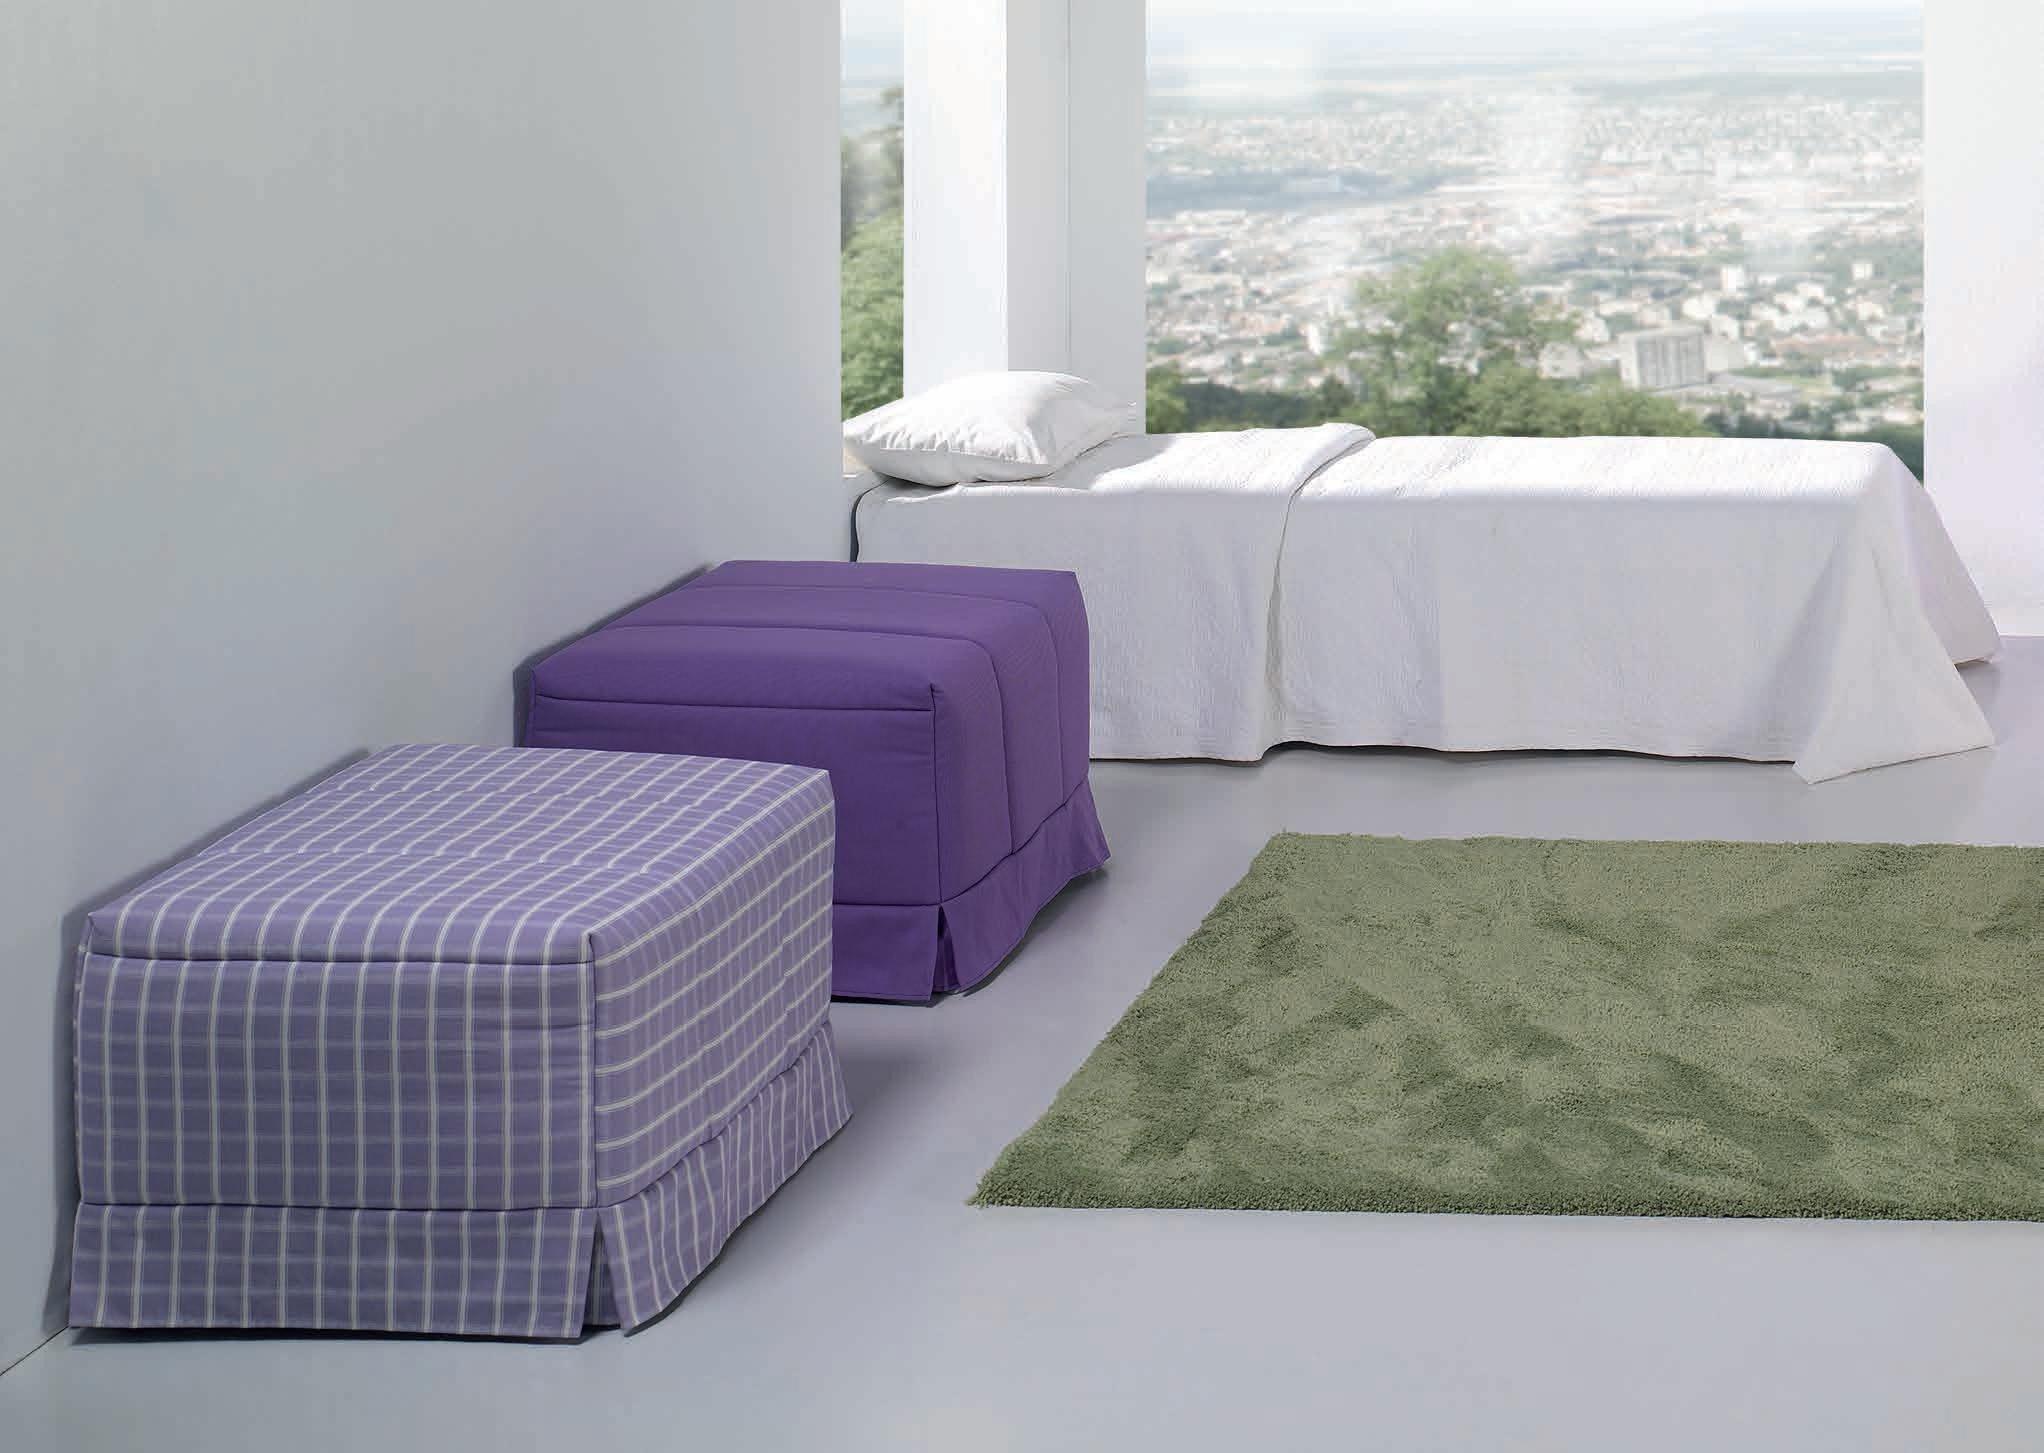 Muebles cama abatibles baratos 20170730030045 for Sofa cama puff barato